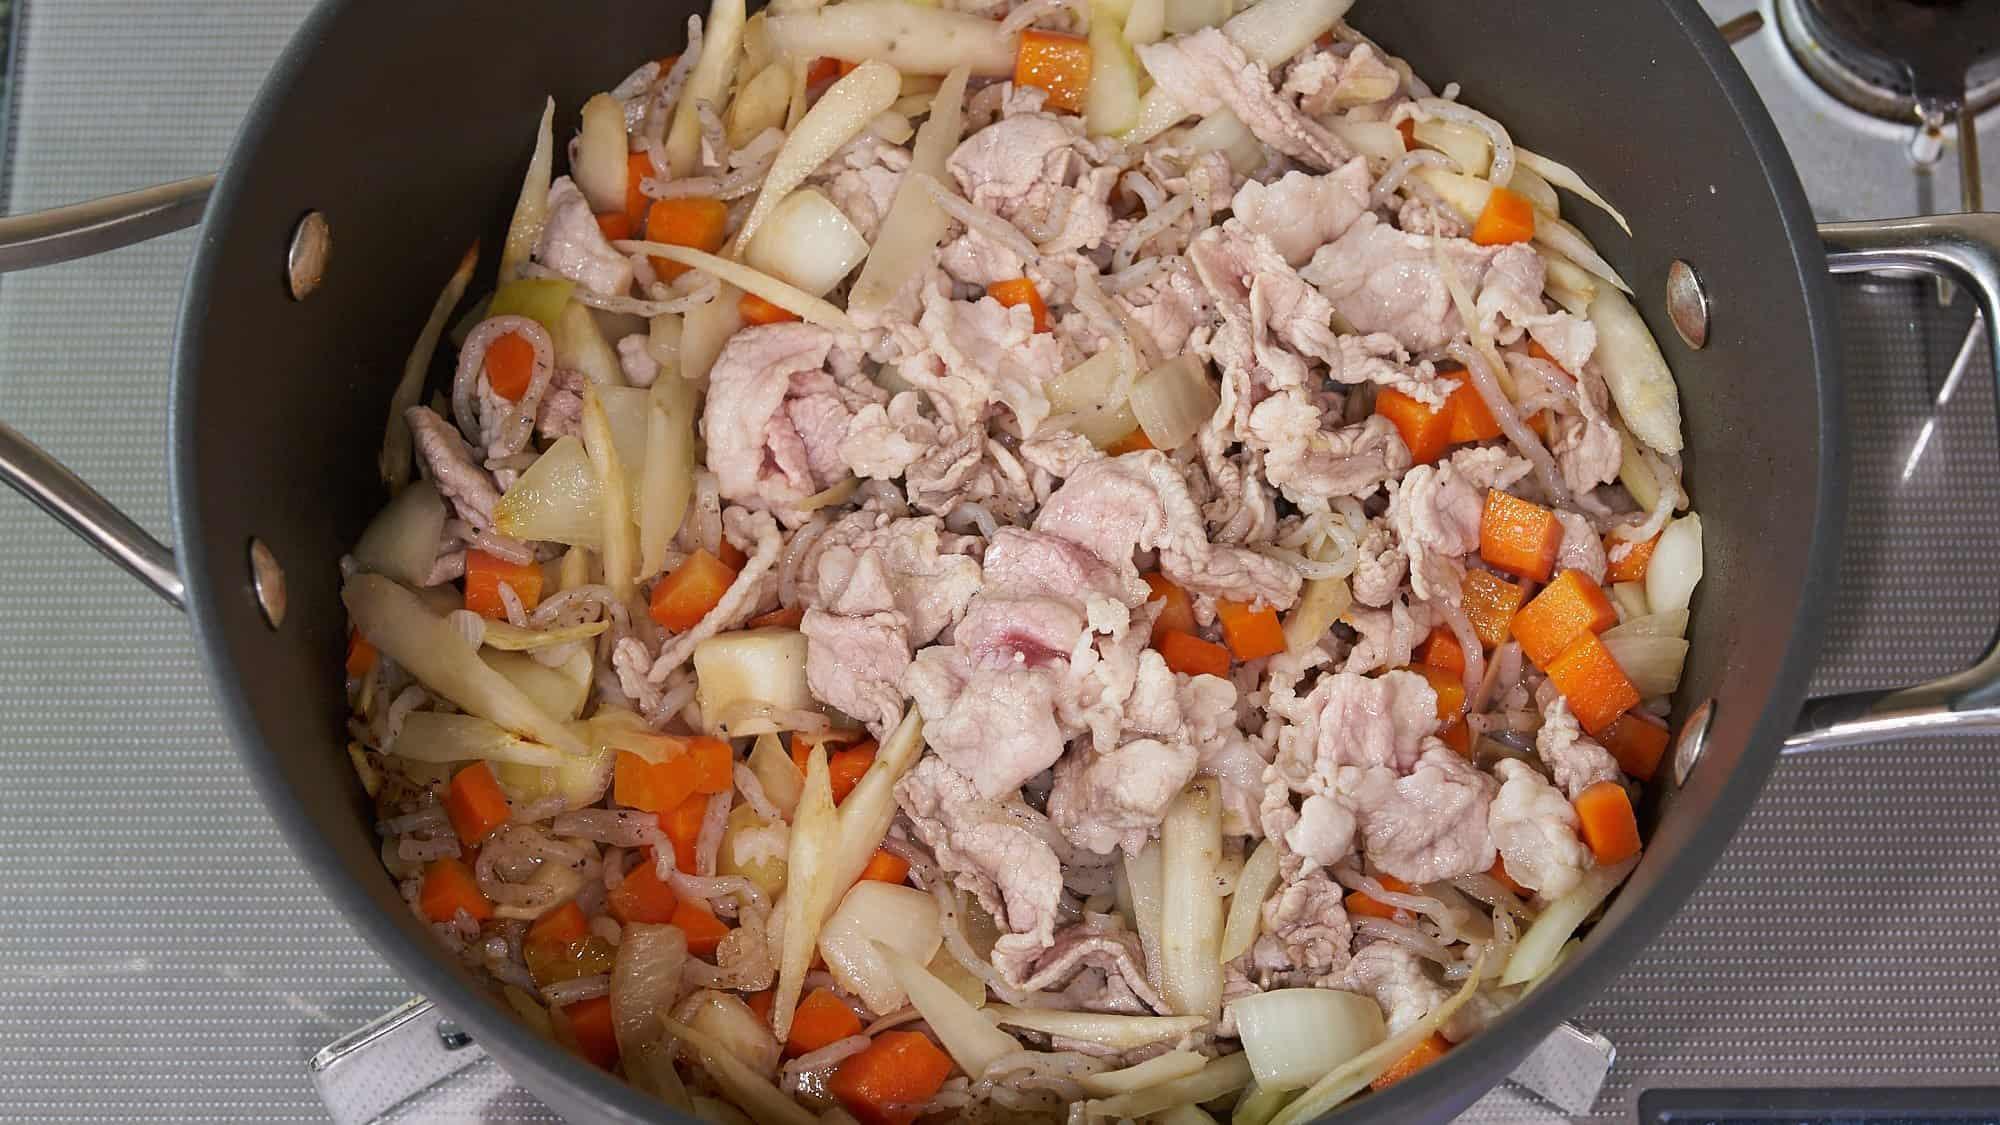 Add pork and saute before adding water to make tonjiru.